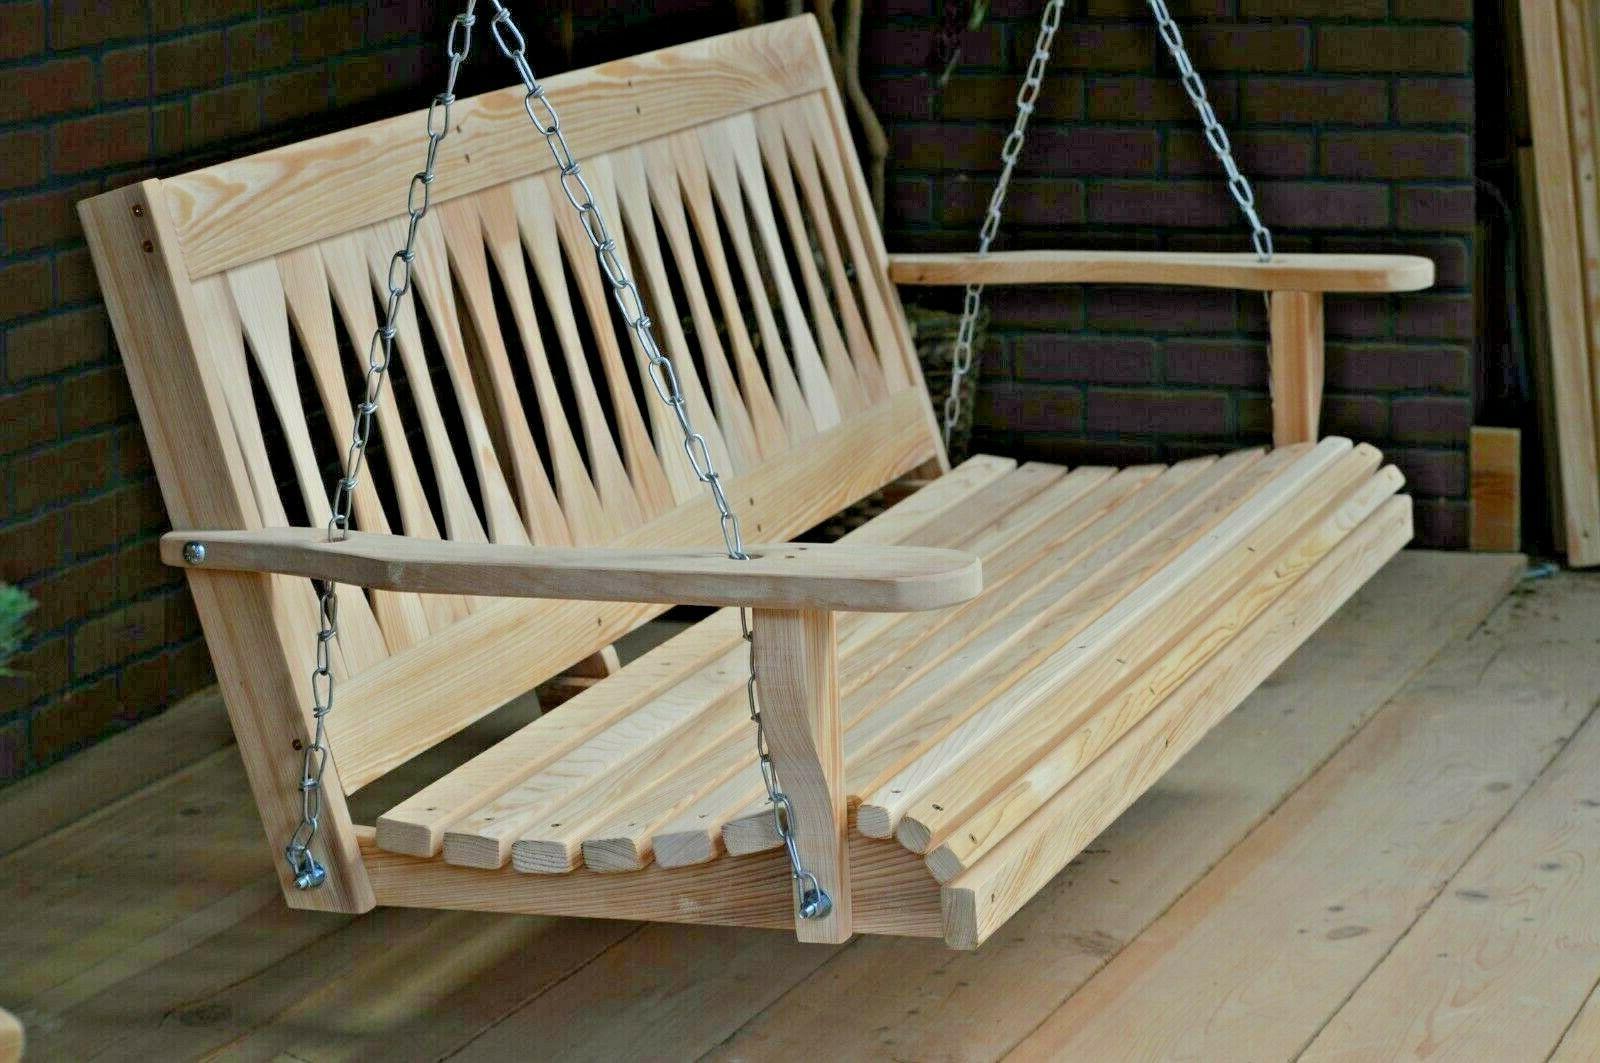 5ft cypress wood diamond porch bench swing